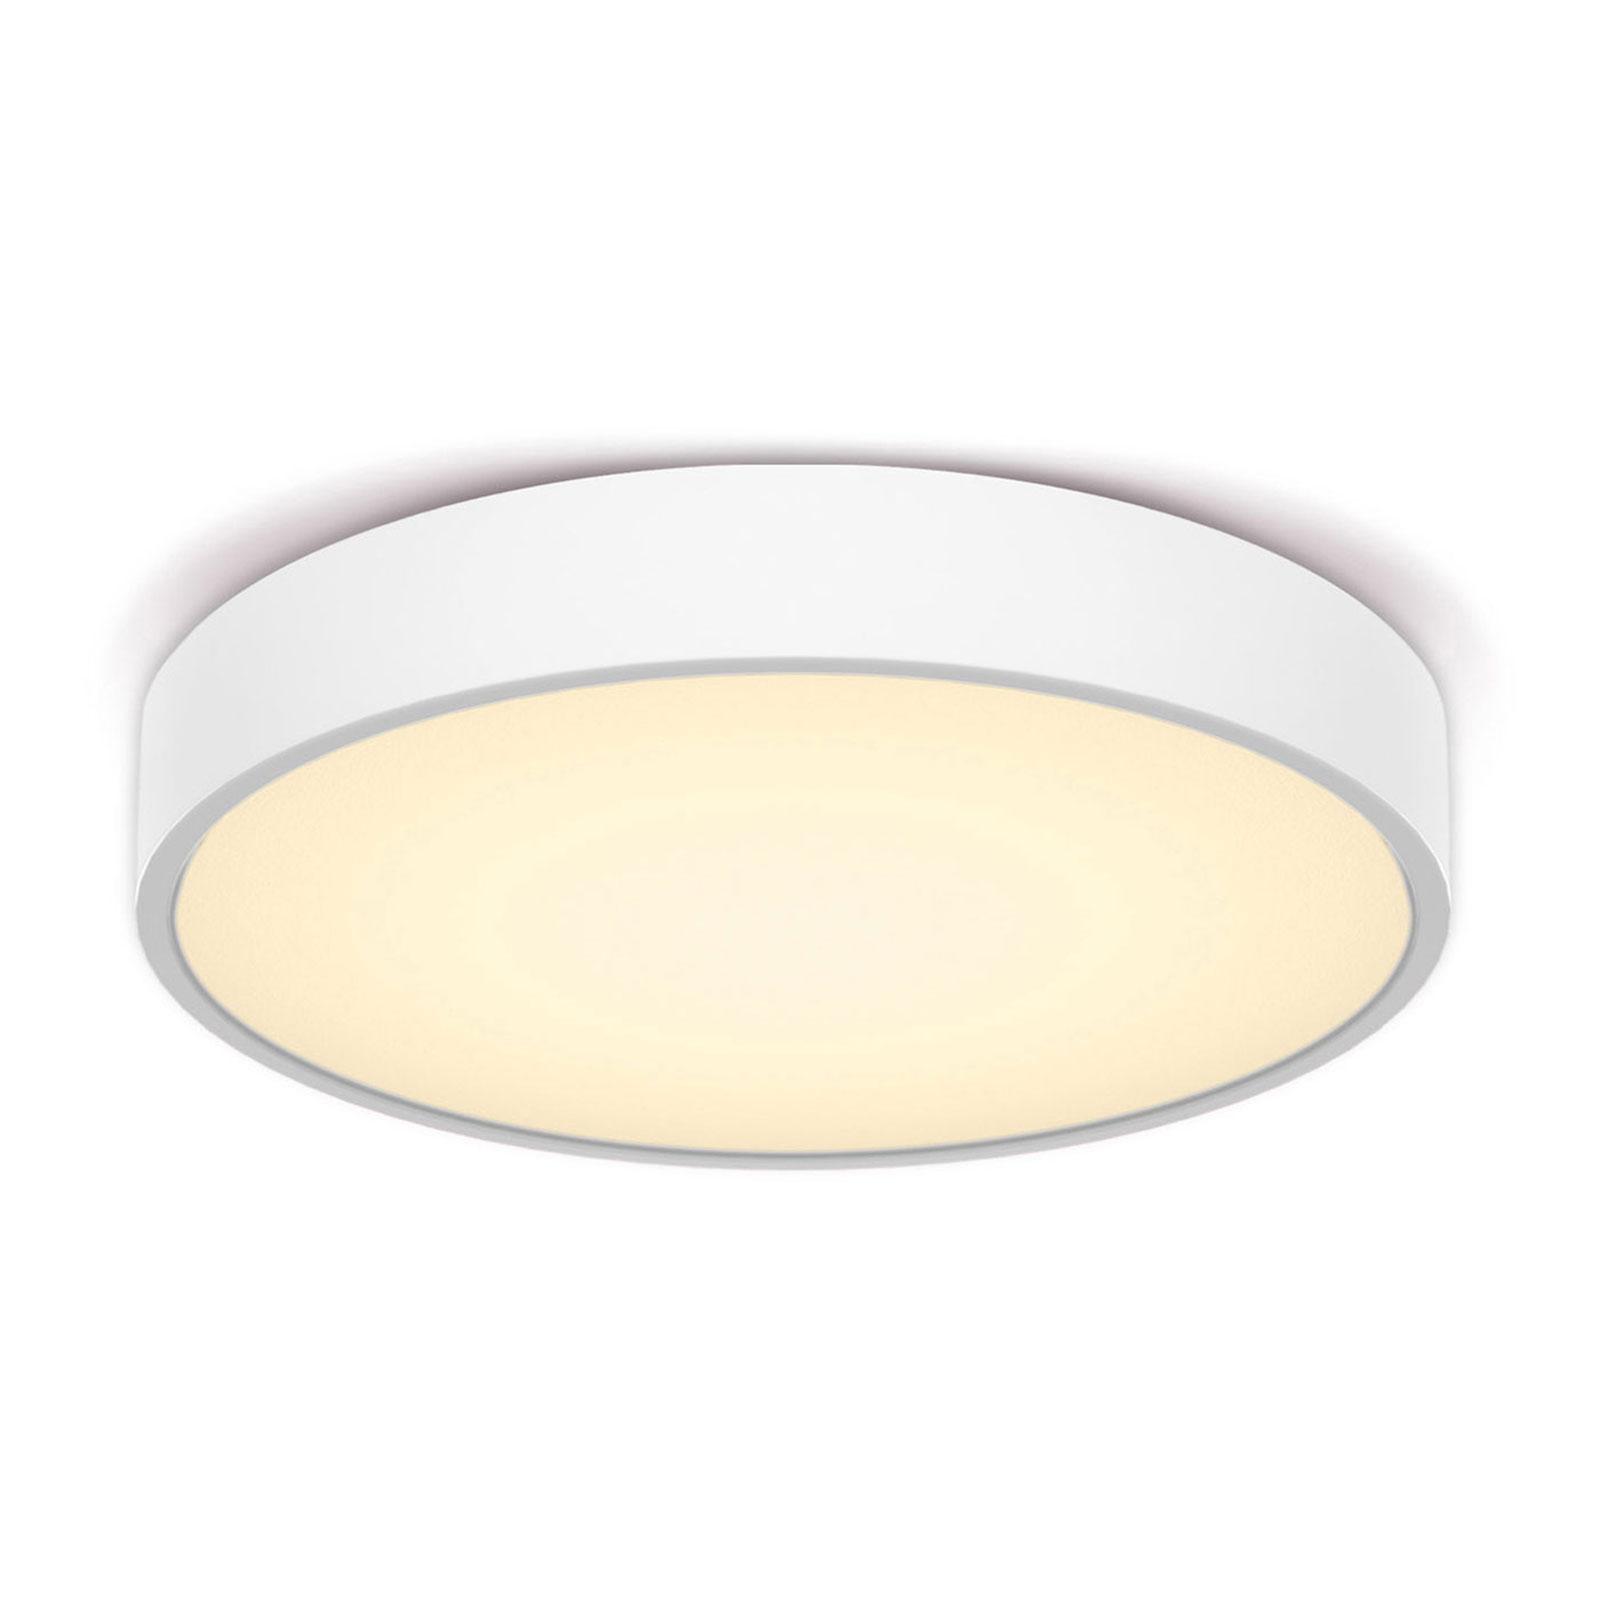 Innr lampa sufitowa LED RCL 110, okrągła, biała